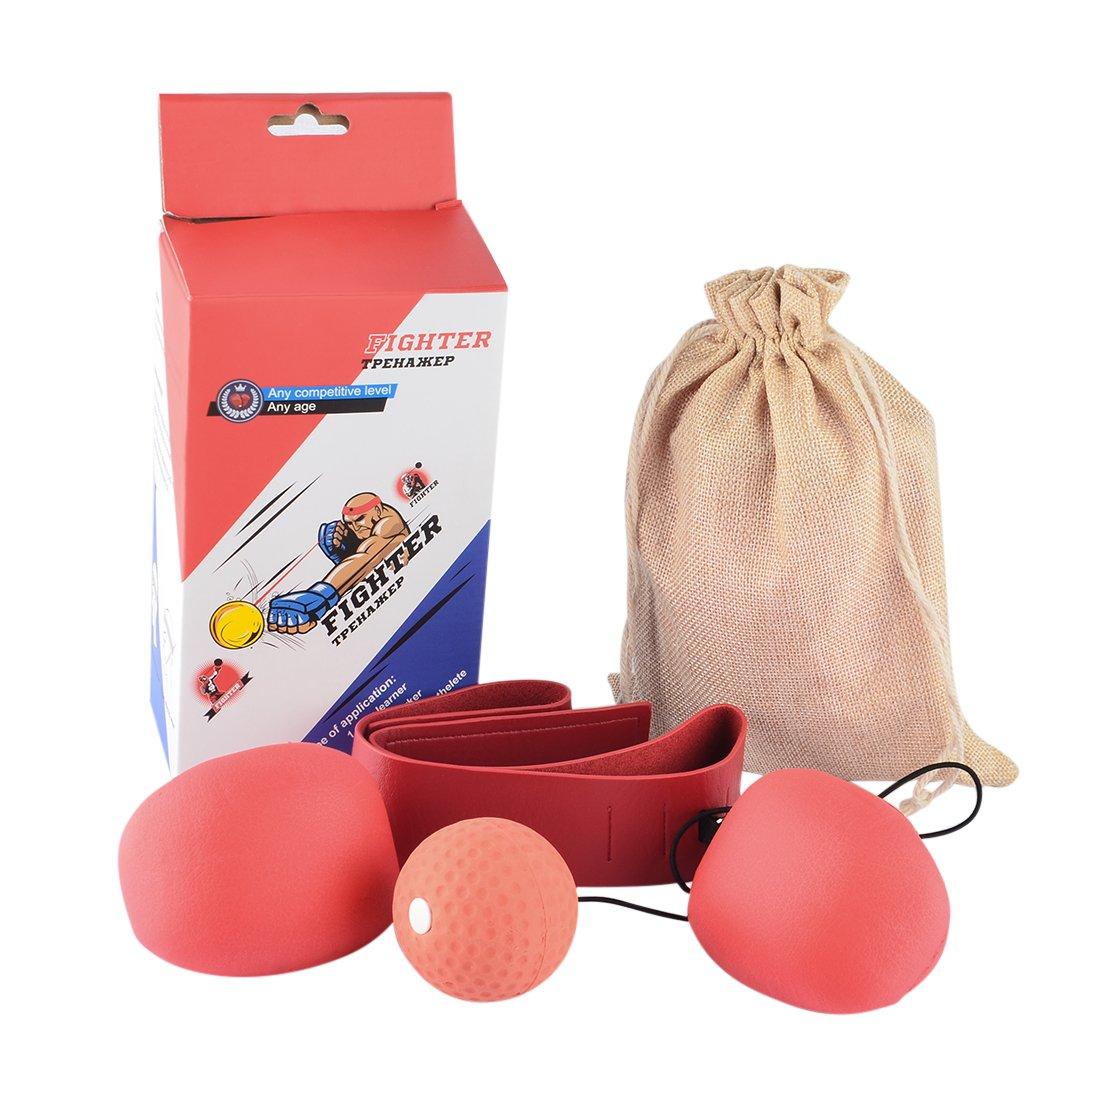 Mecotech Fight Ball Reflex, Cajas Reflex Ball Punching Cajas Cajas Speed Ball para Cajas Gym MMA y Otros Deportes de Lucha